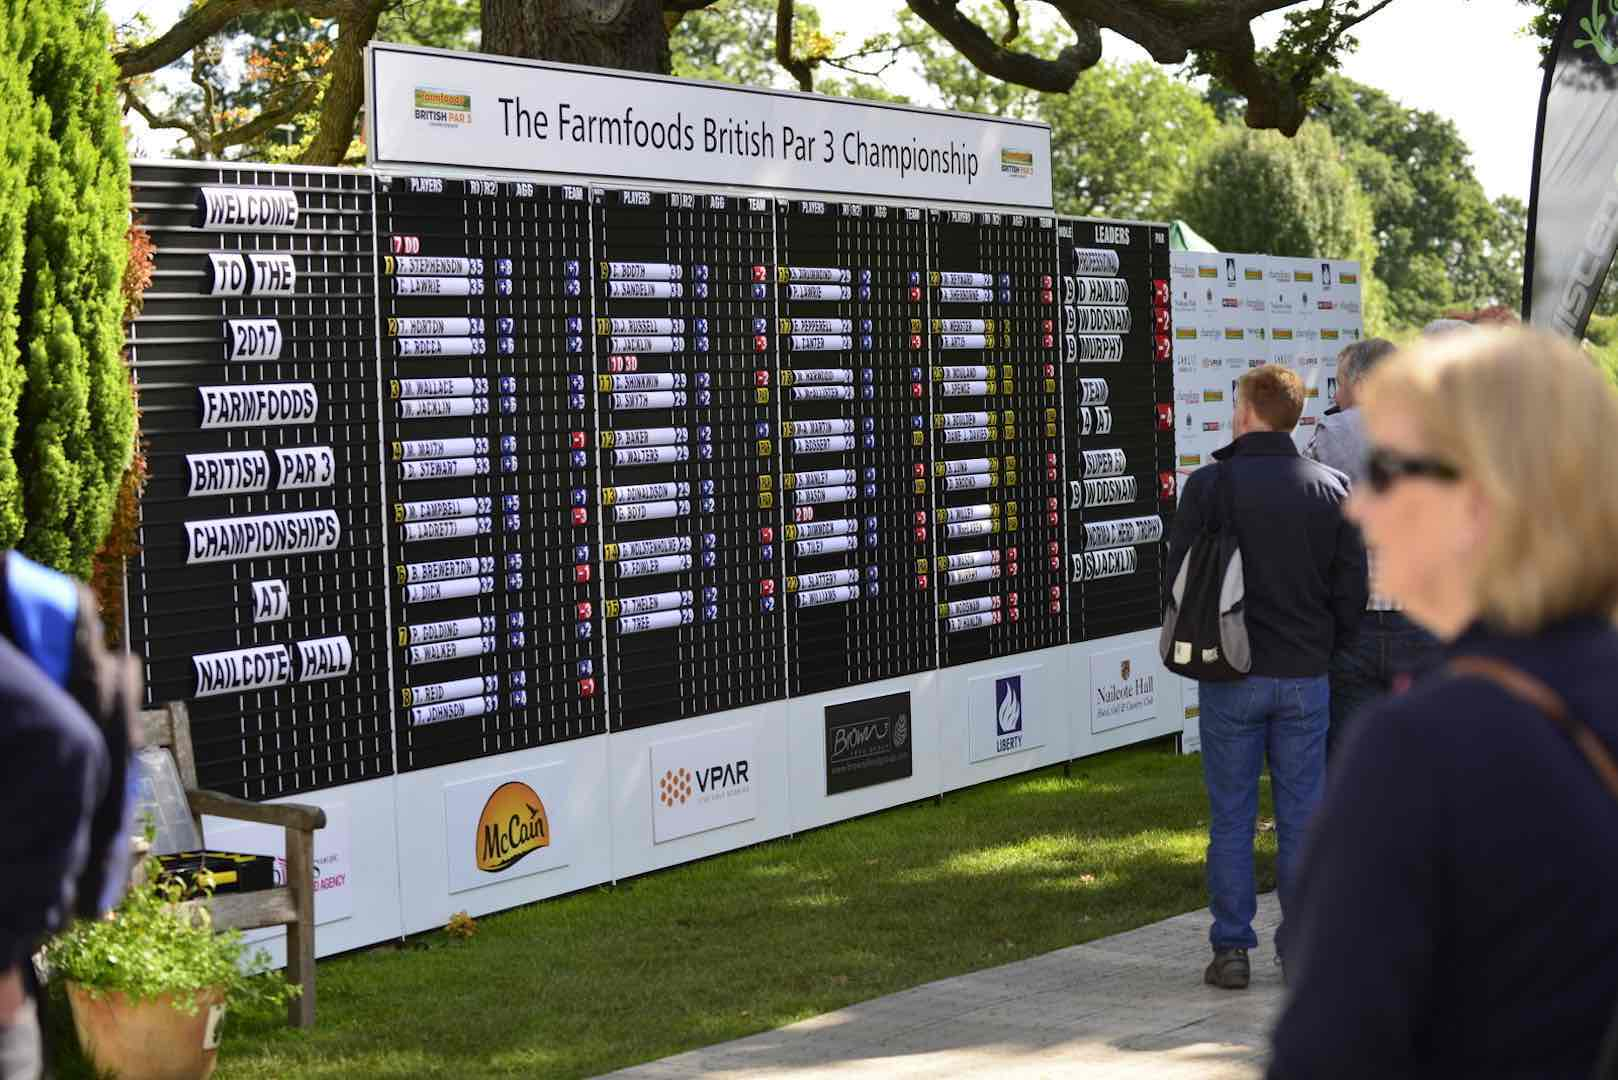 Farmfoods British Par 3 Championship to support next generation of golfing stars